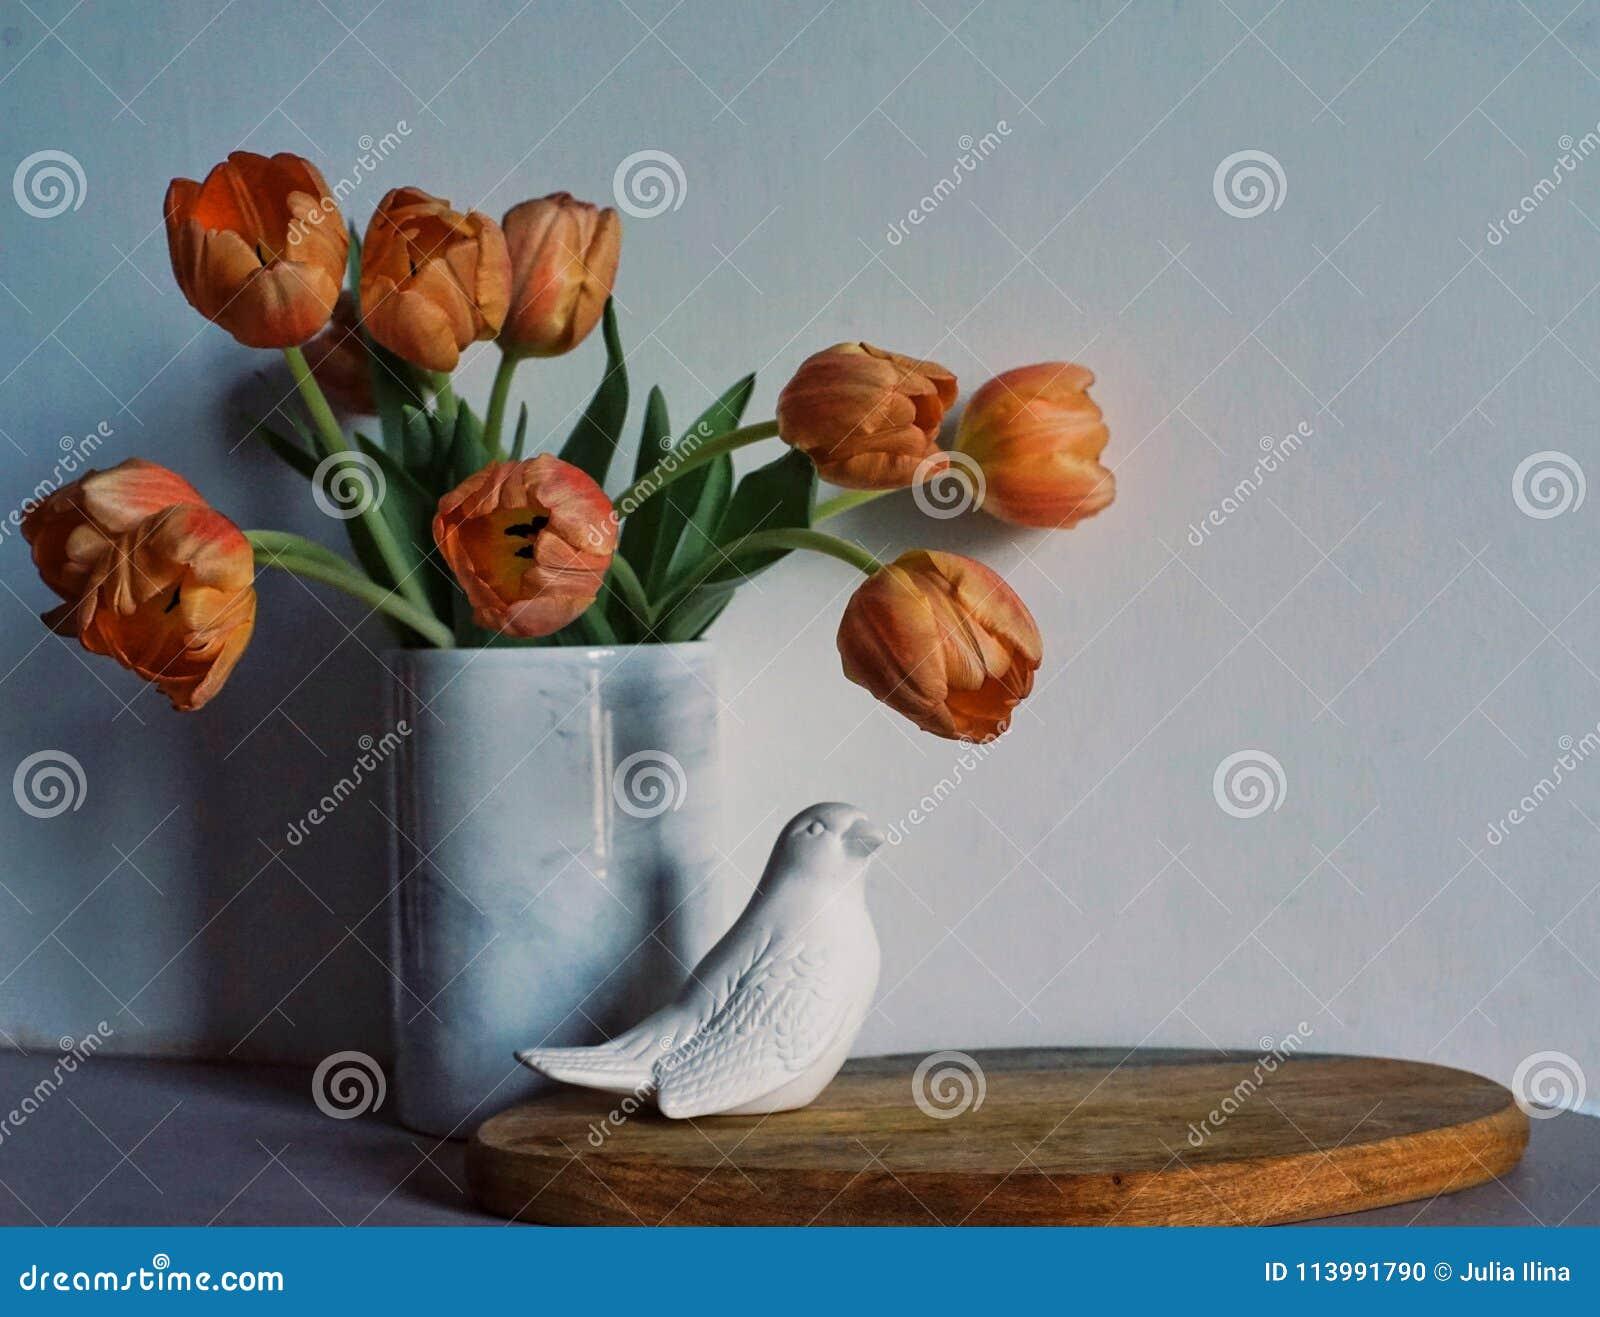 tulips flowers bouquet close-up white vase wall bird indoor